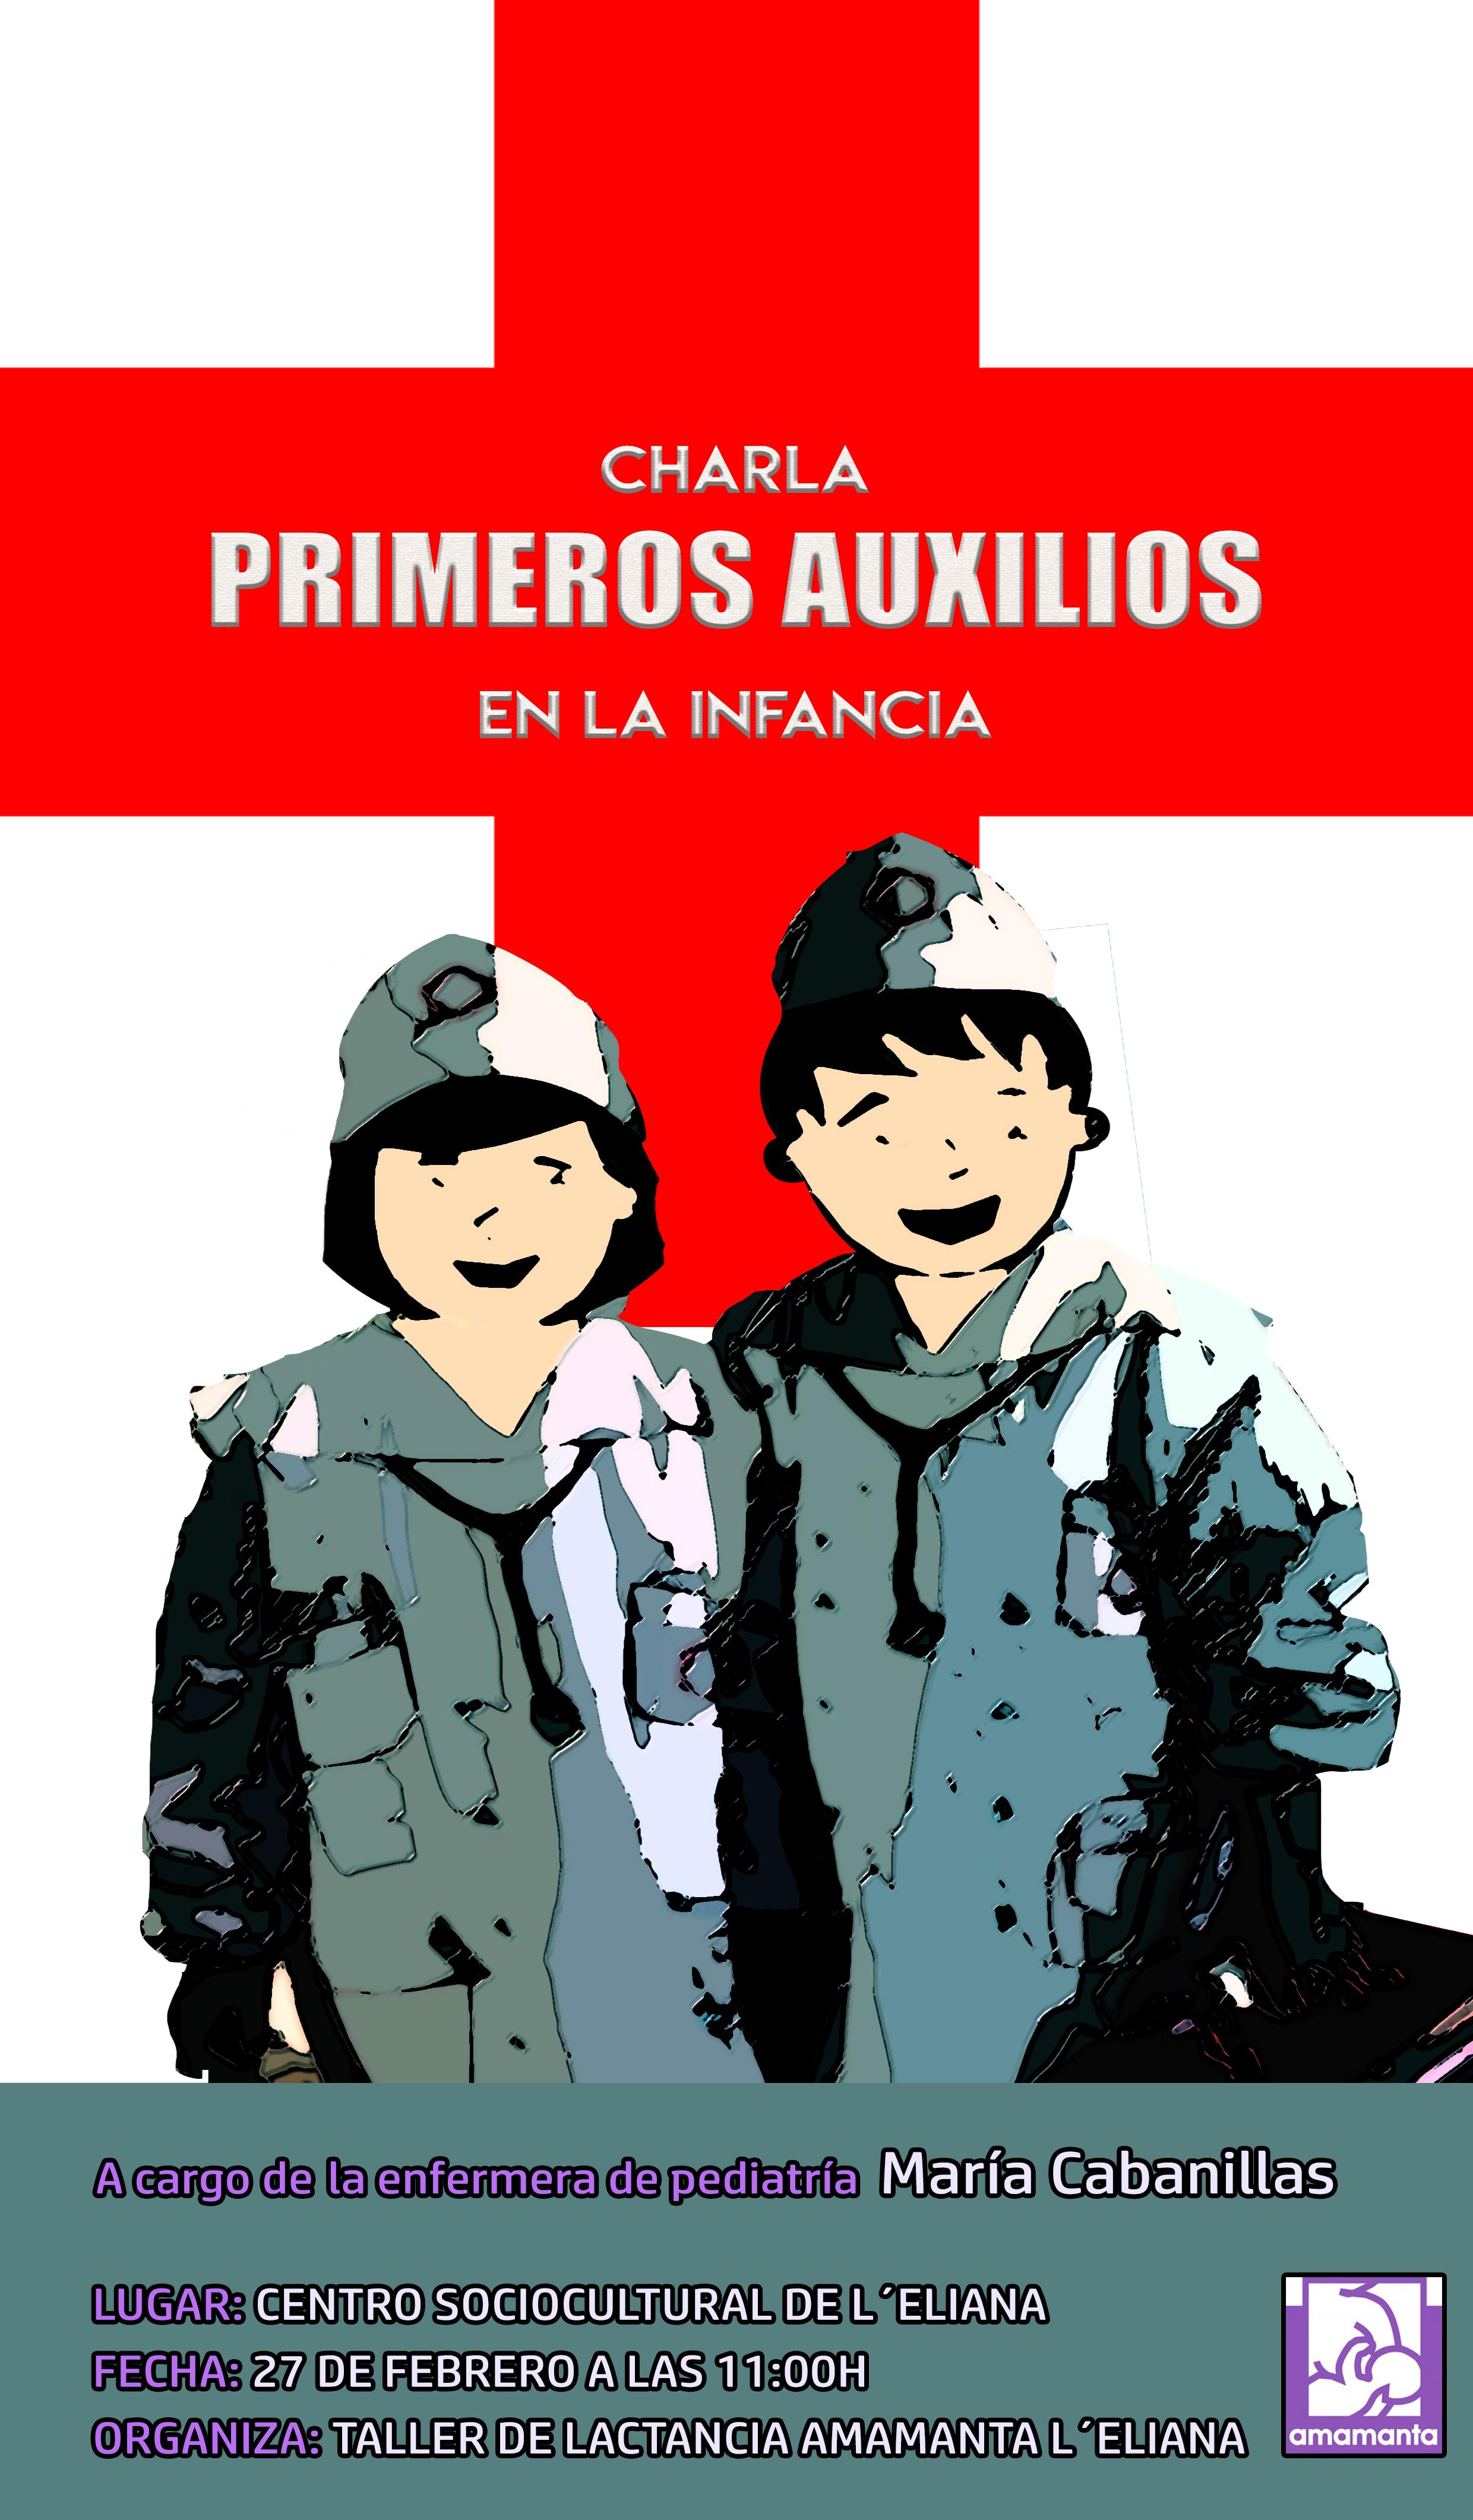 CHARLA PRIMEROS AUXILIOS INFANCIA